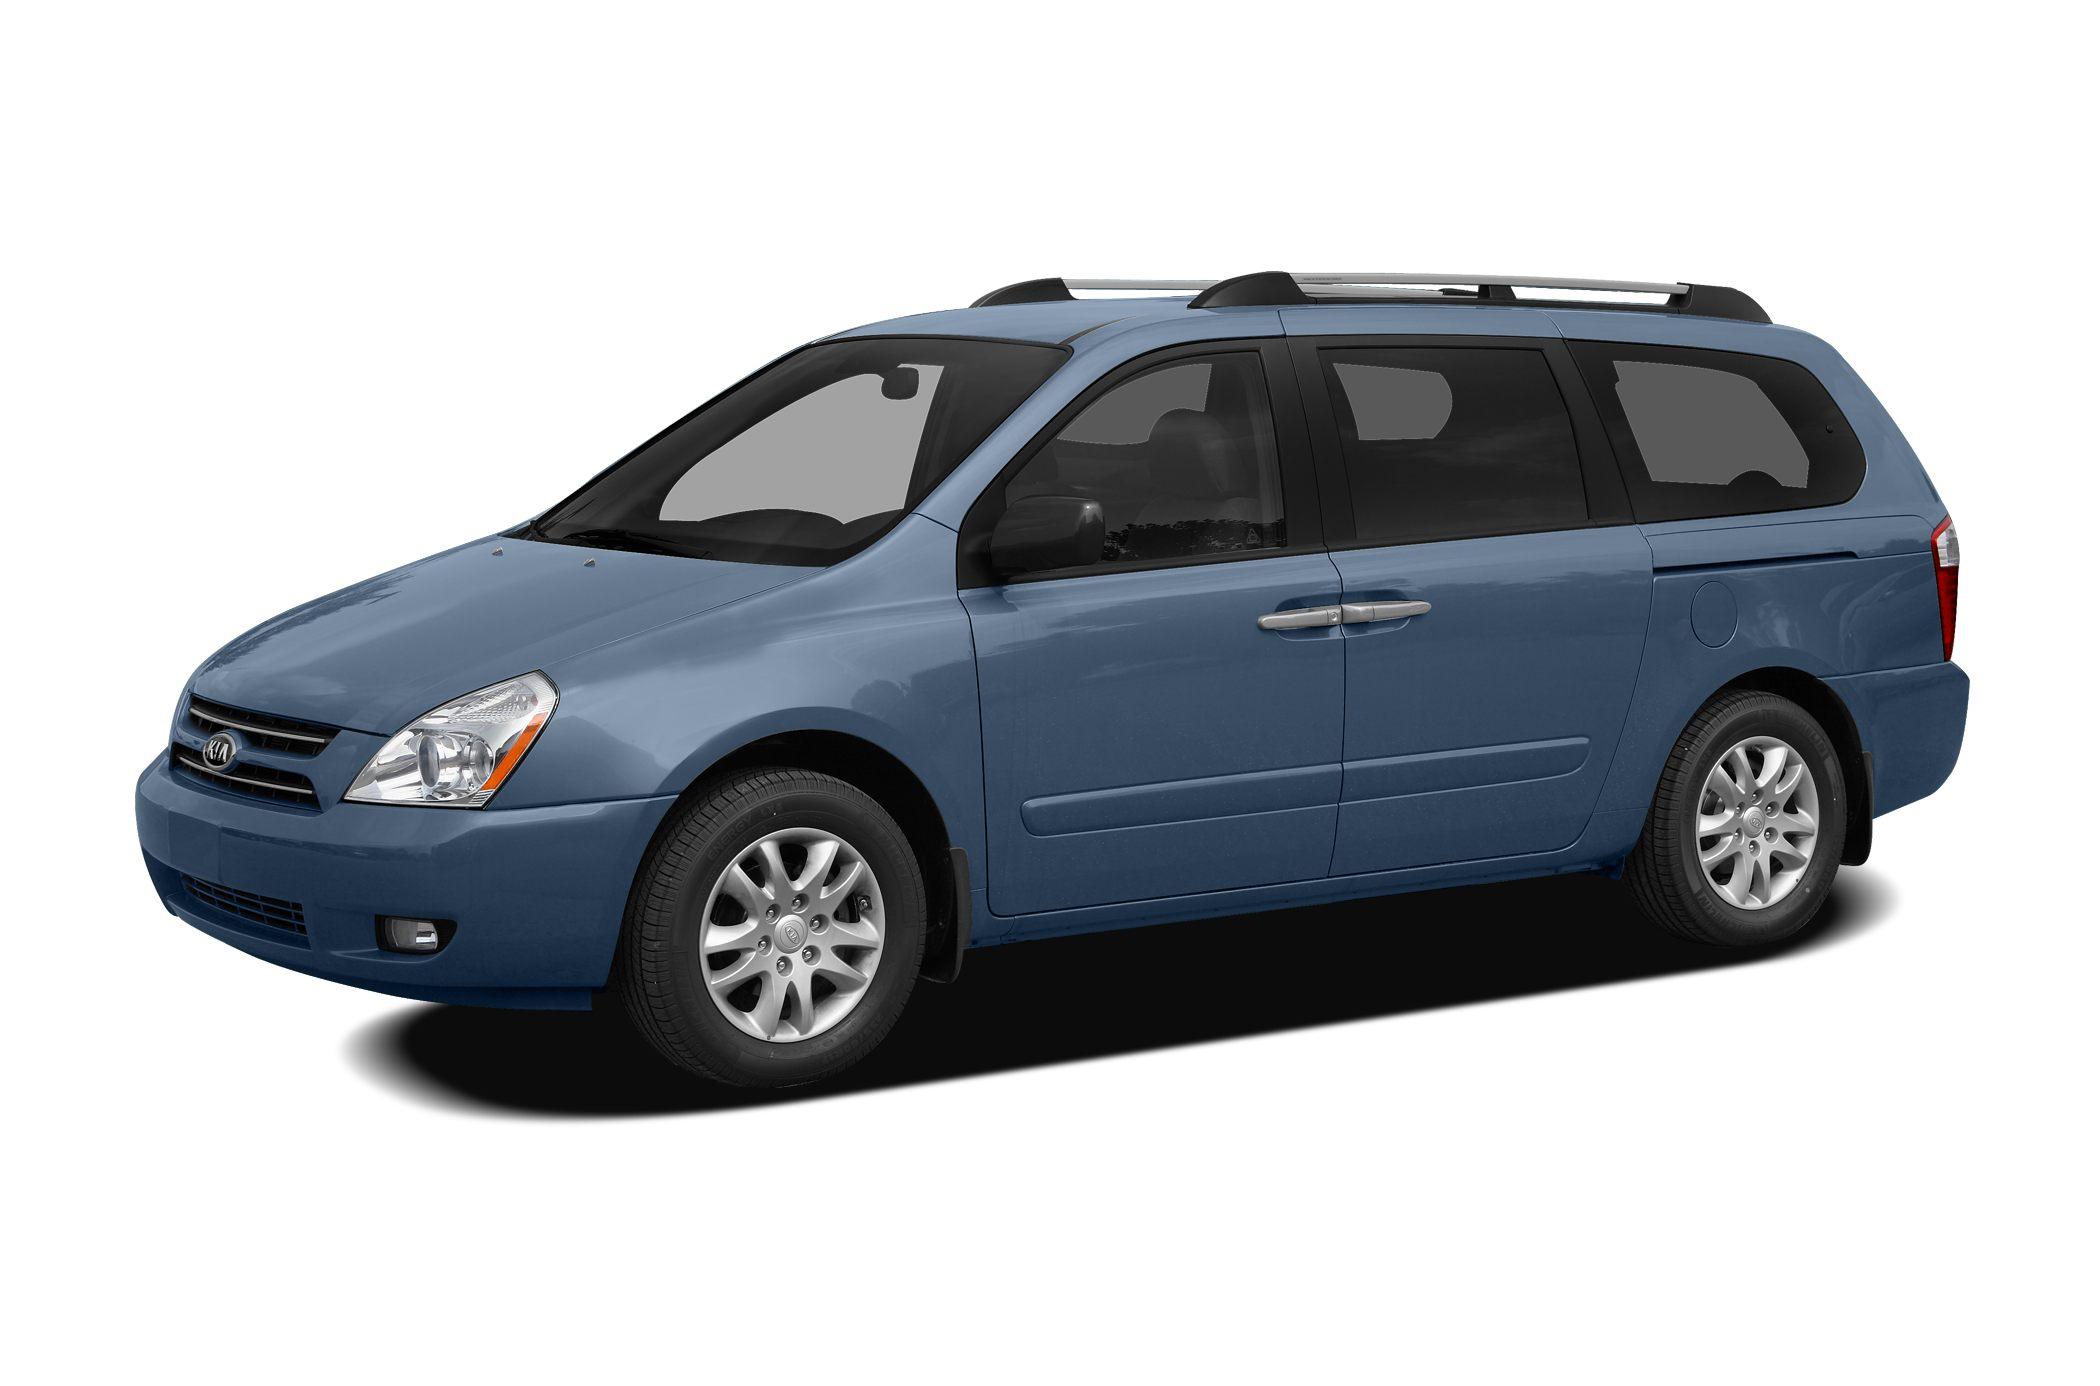 2007 Kia Sedona EX Minivan for sale in Quakertown for $11,481 with 70,447 miles